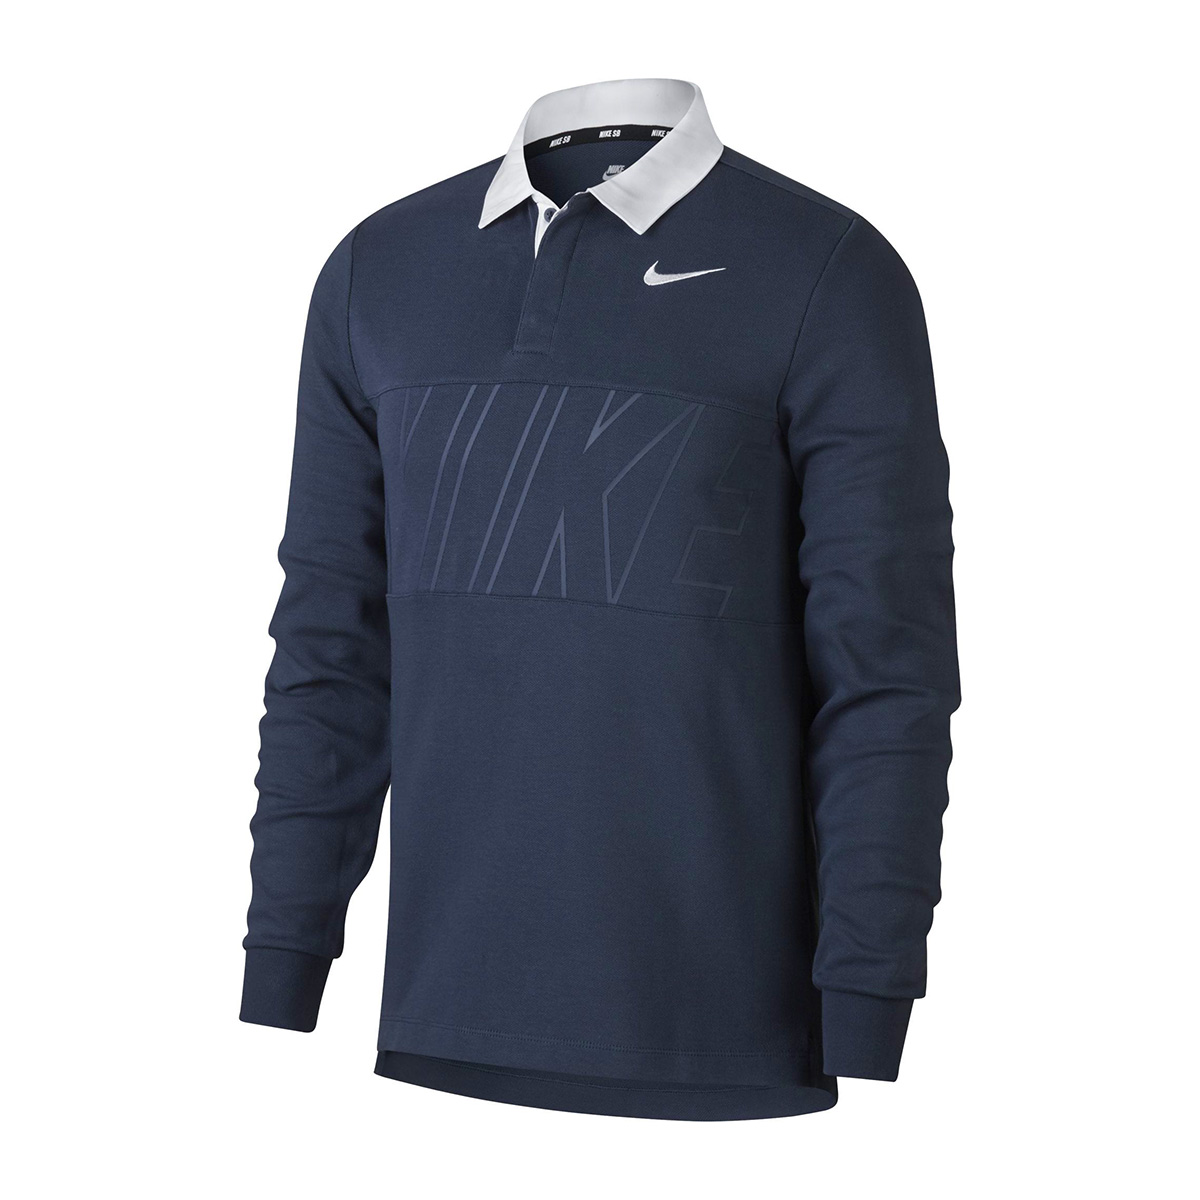 Nike sb dry long sleeve skateboarding polo shirt clothes for Nike sb galaxy shirt